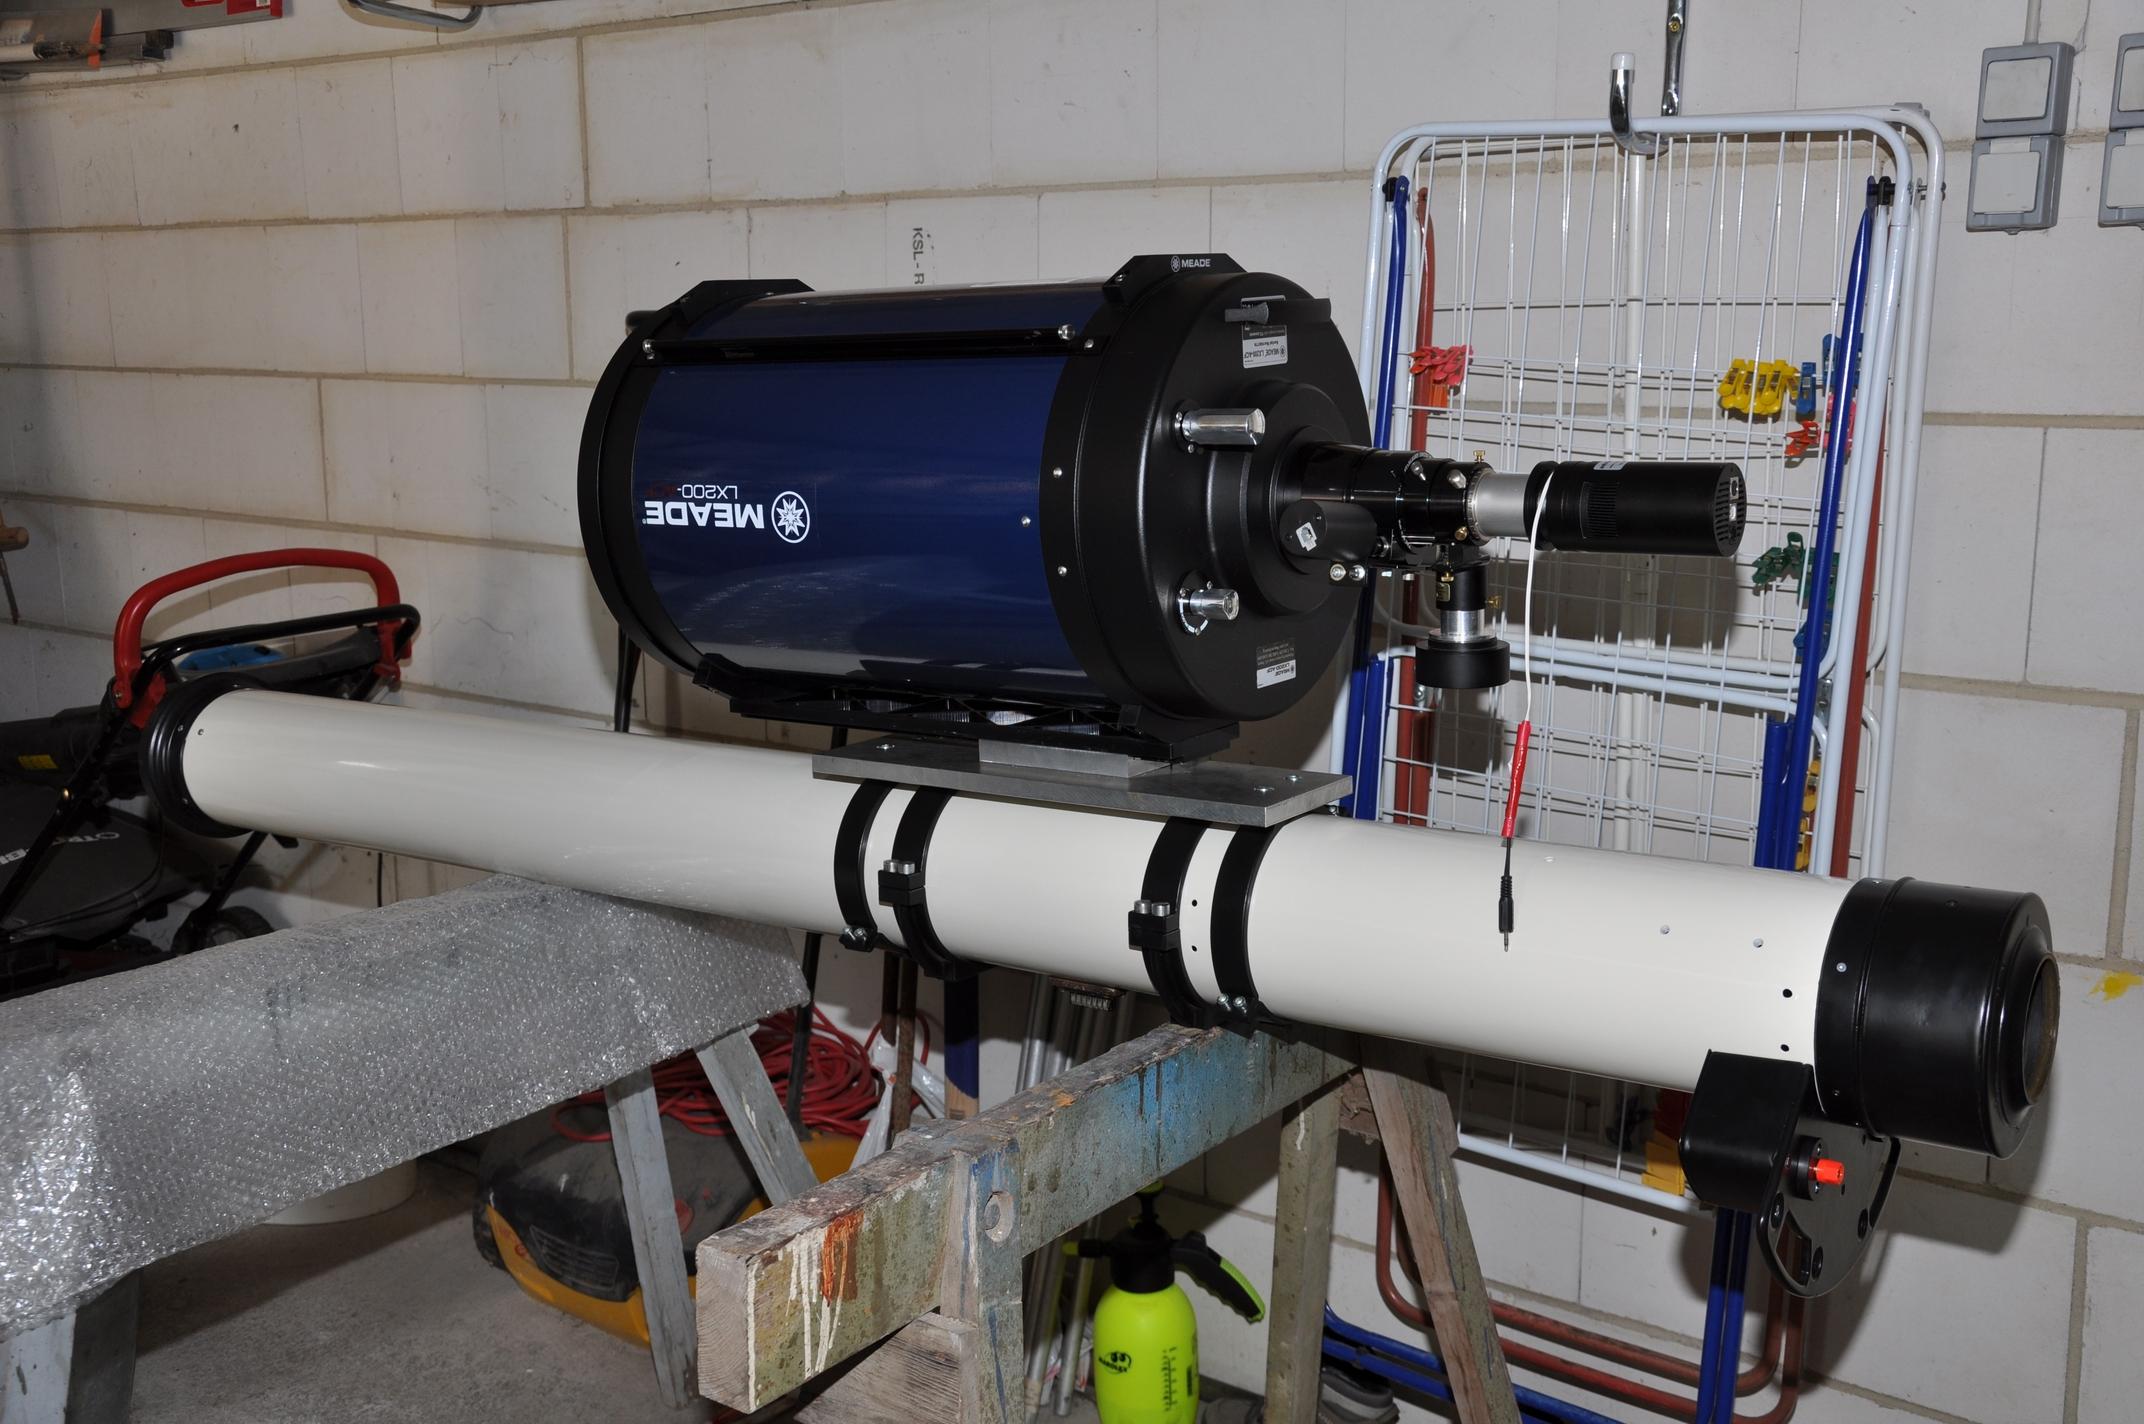 Meade ACF 12 Zoll Spiegelteleskop Testaufbau